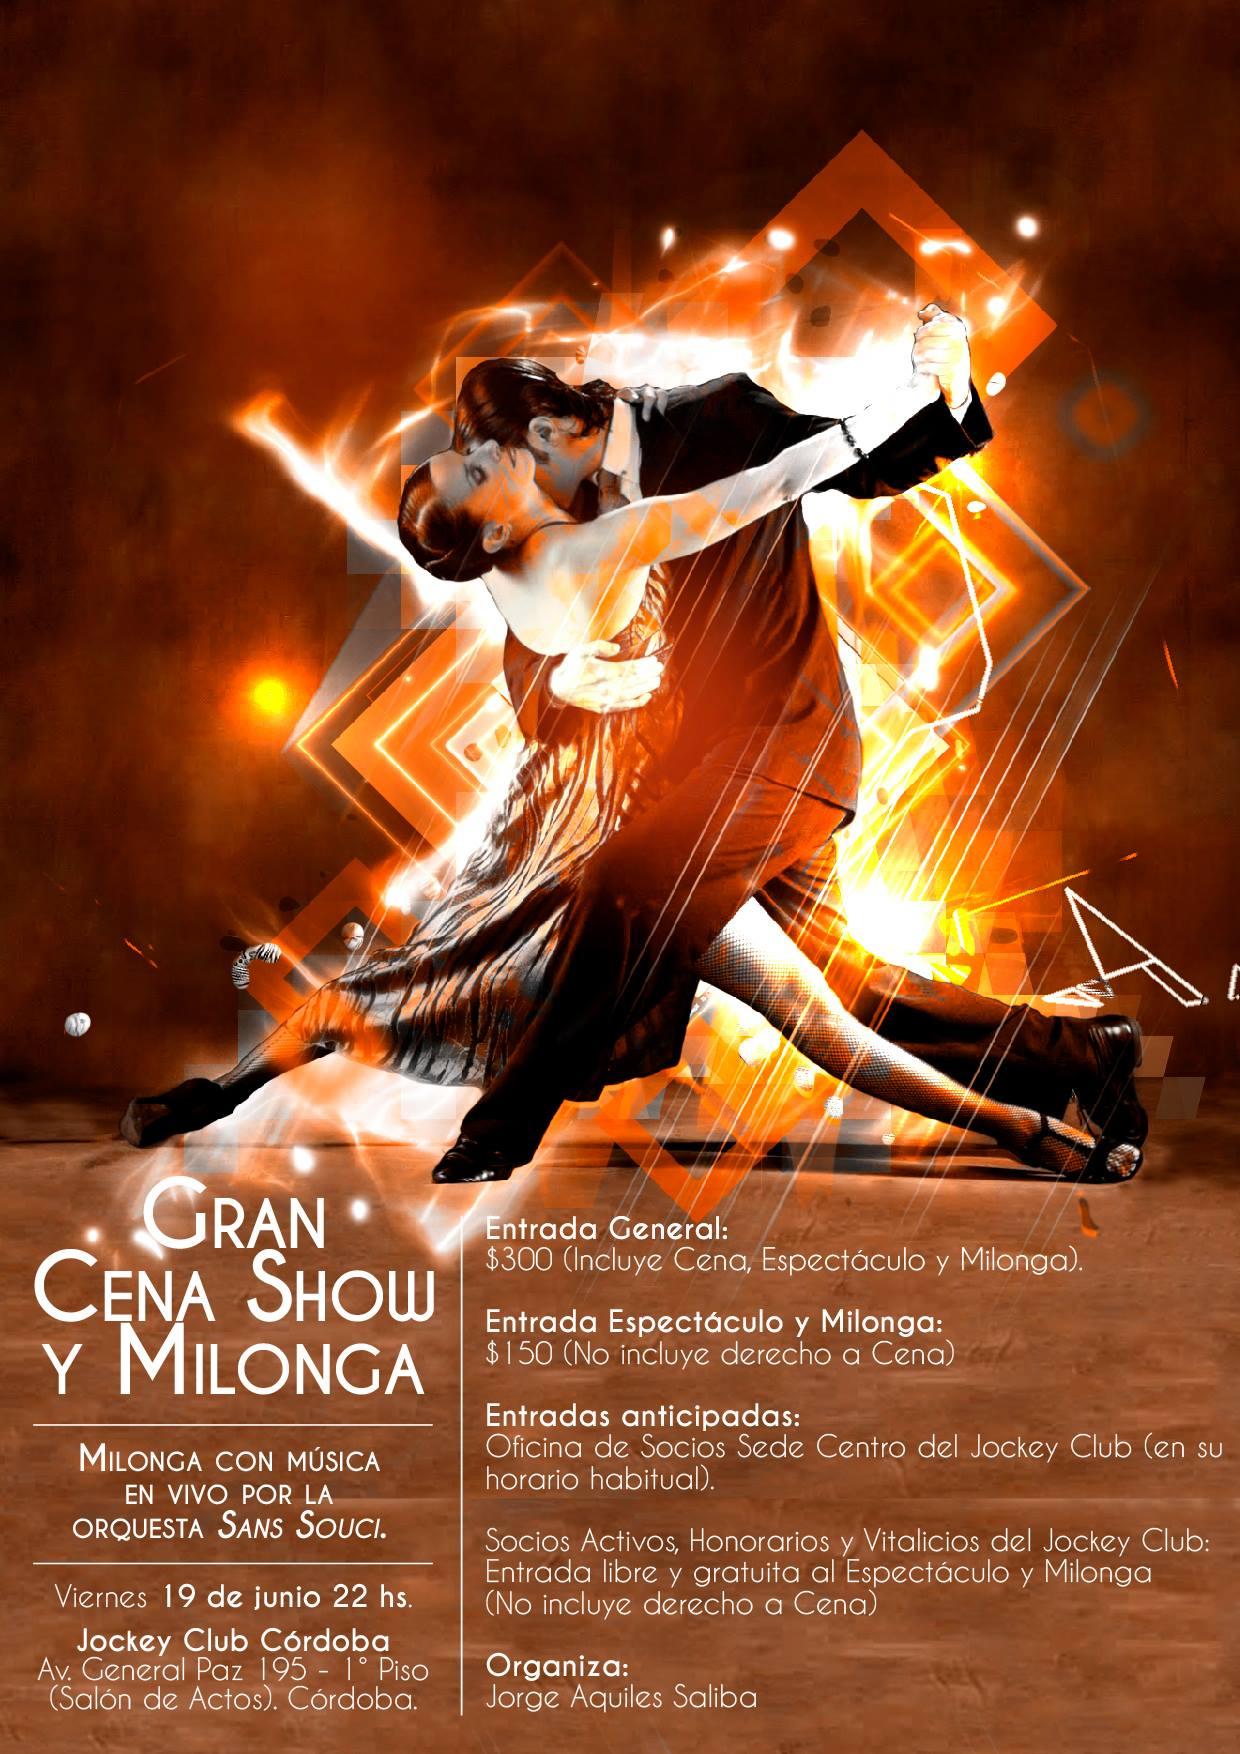 Gran Cena Show y Milonga